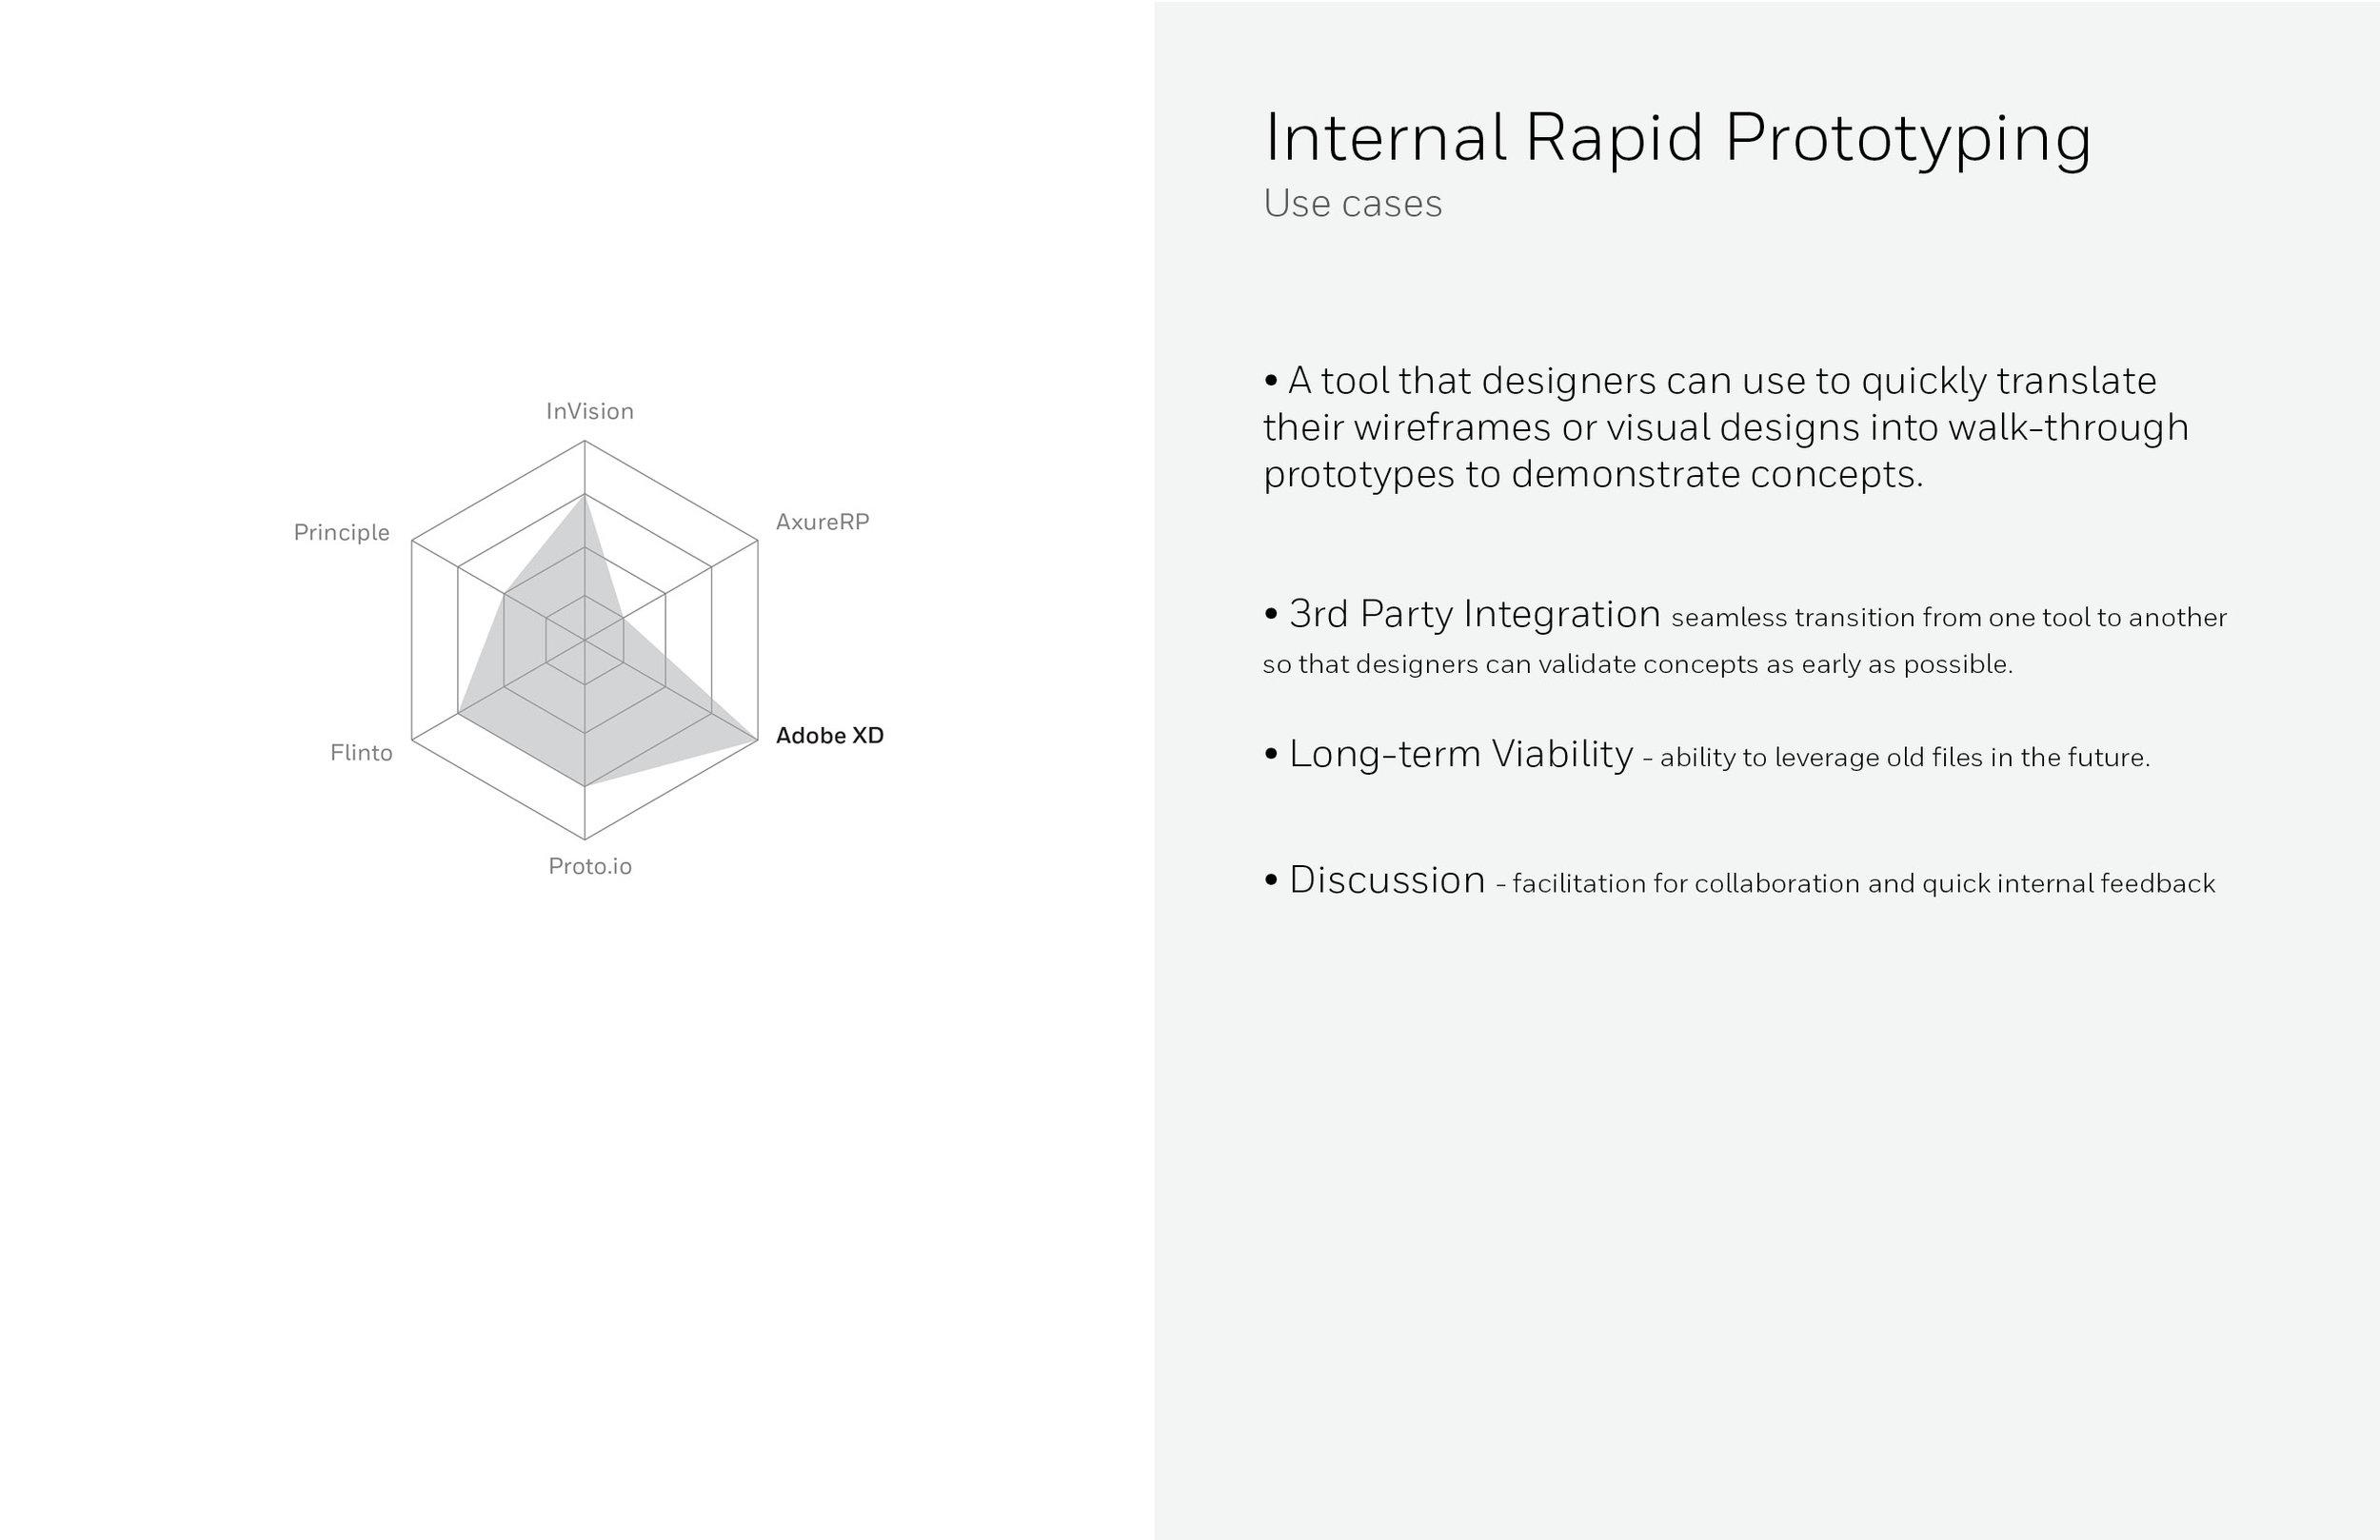 PrototypingTools_30.jpg